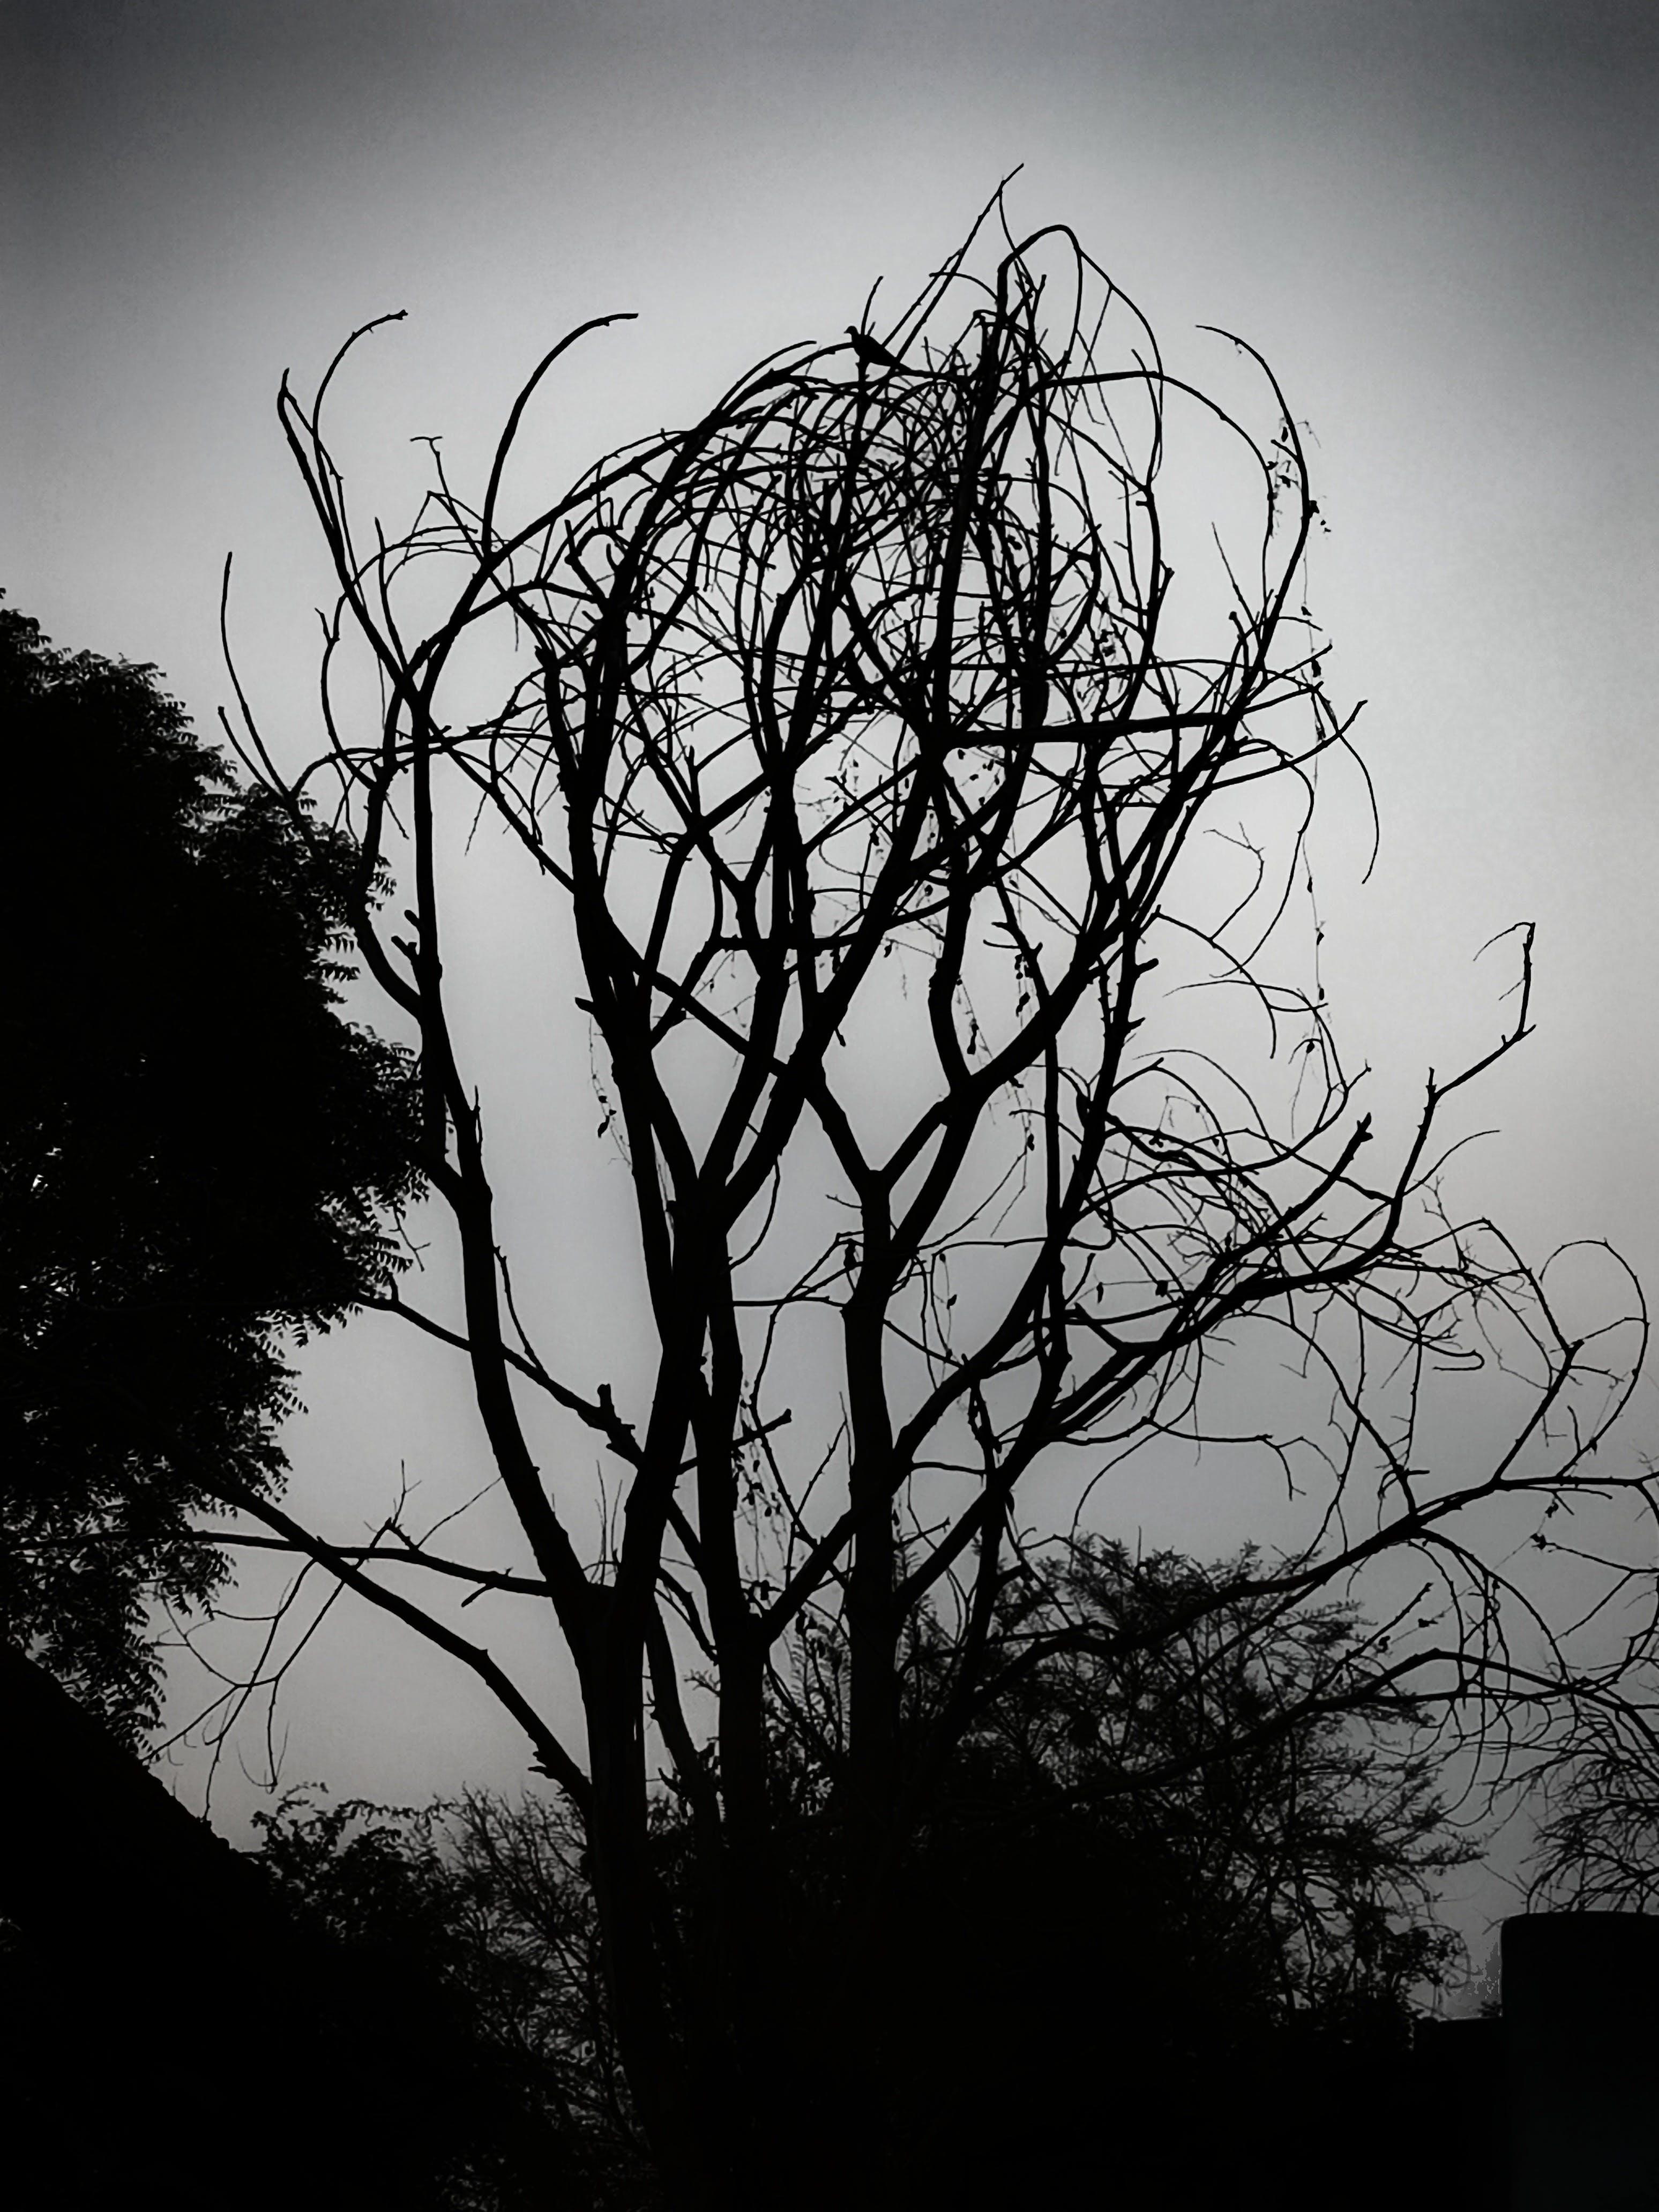 Foto d'estoc gratuïta de #autumn #nature #photography #sky #photooftheday #, #deadtree #nature #tree #photography #trees #sky #